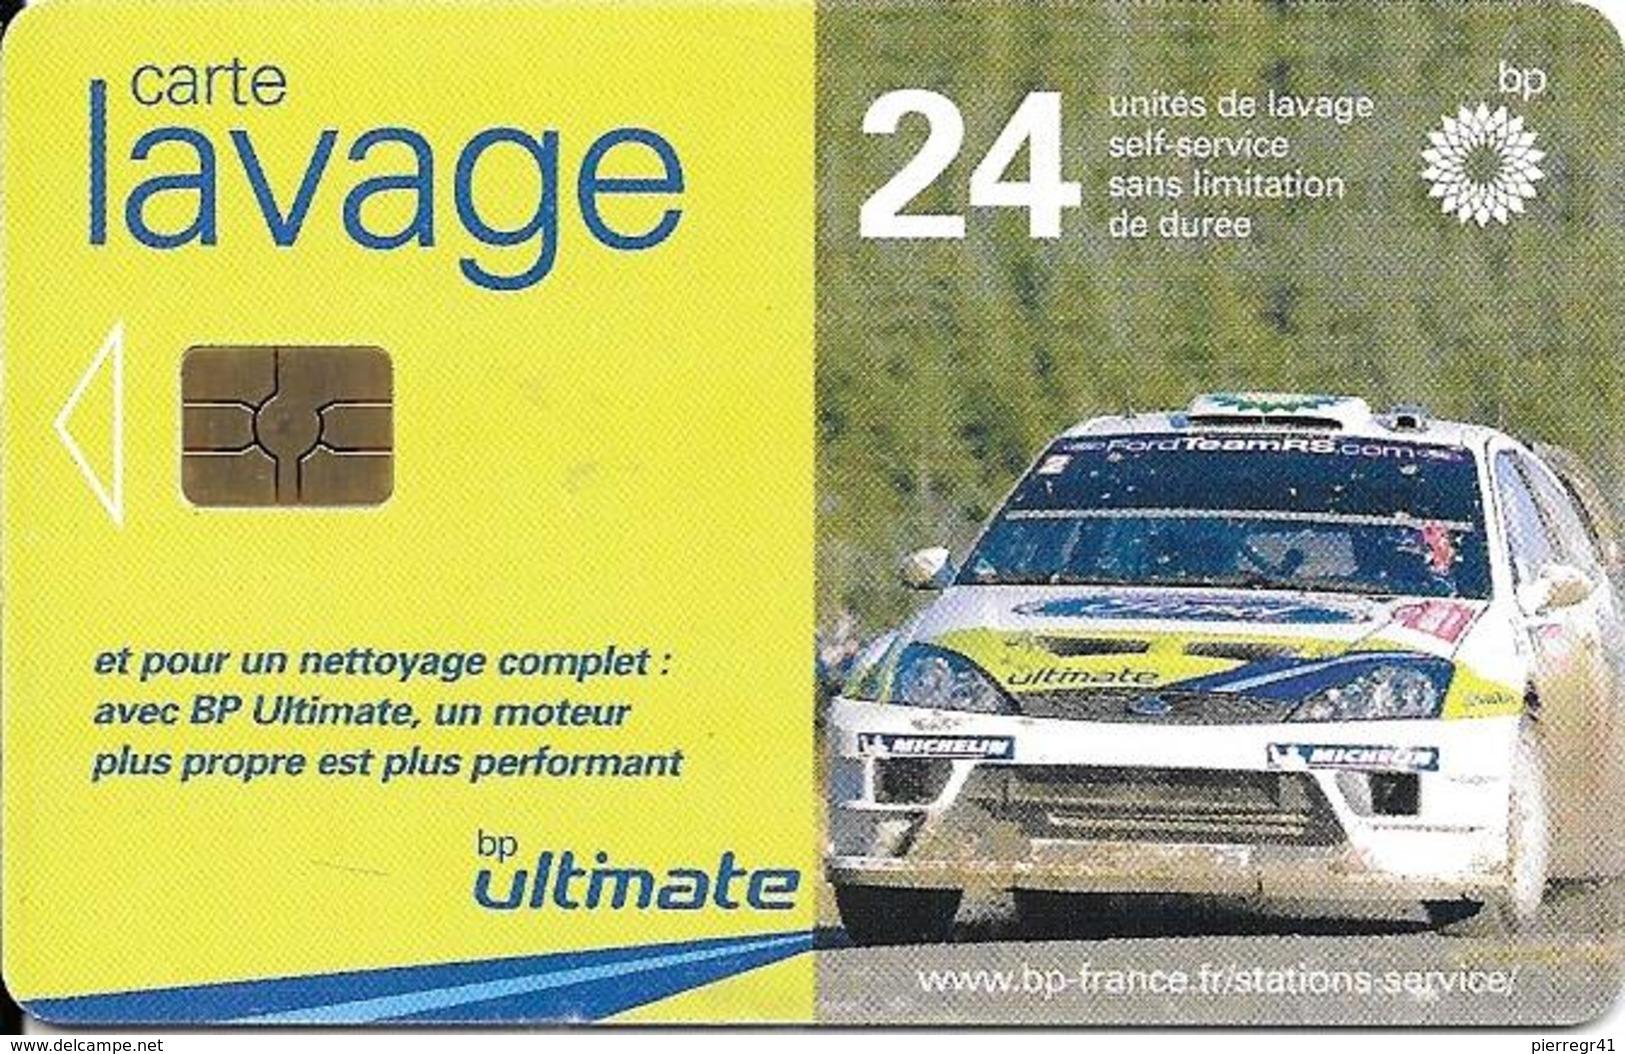 CARTE-PUCE-GEM 6--LAVAGE-BP-24-UNITES-VOITURE RALLYE-BE - France